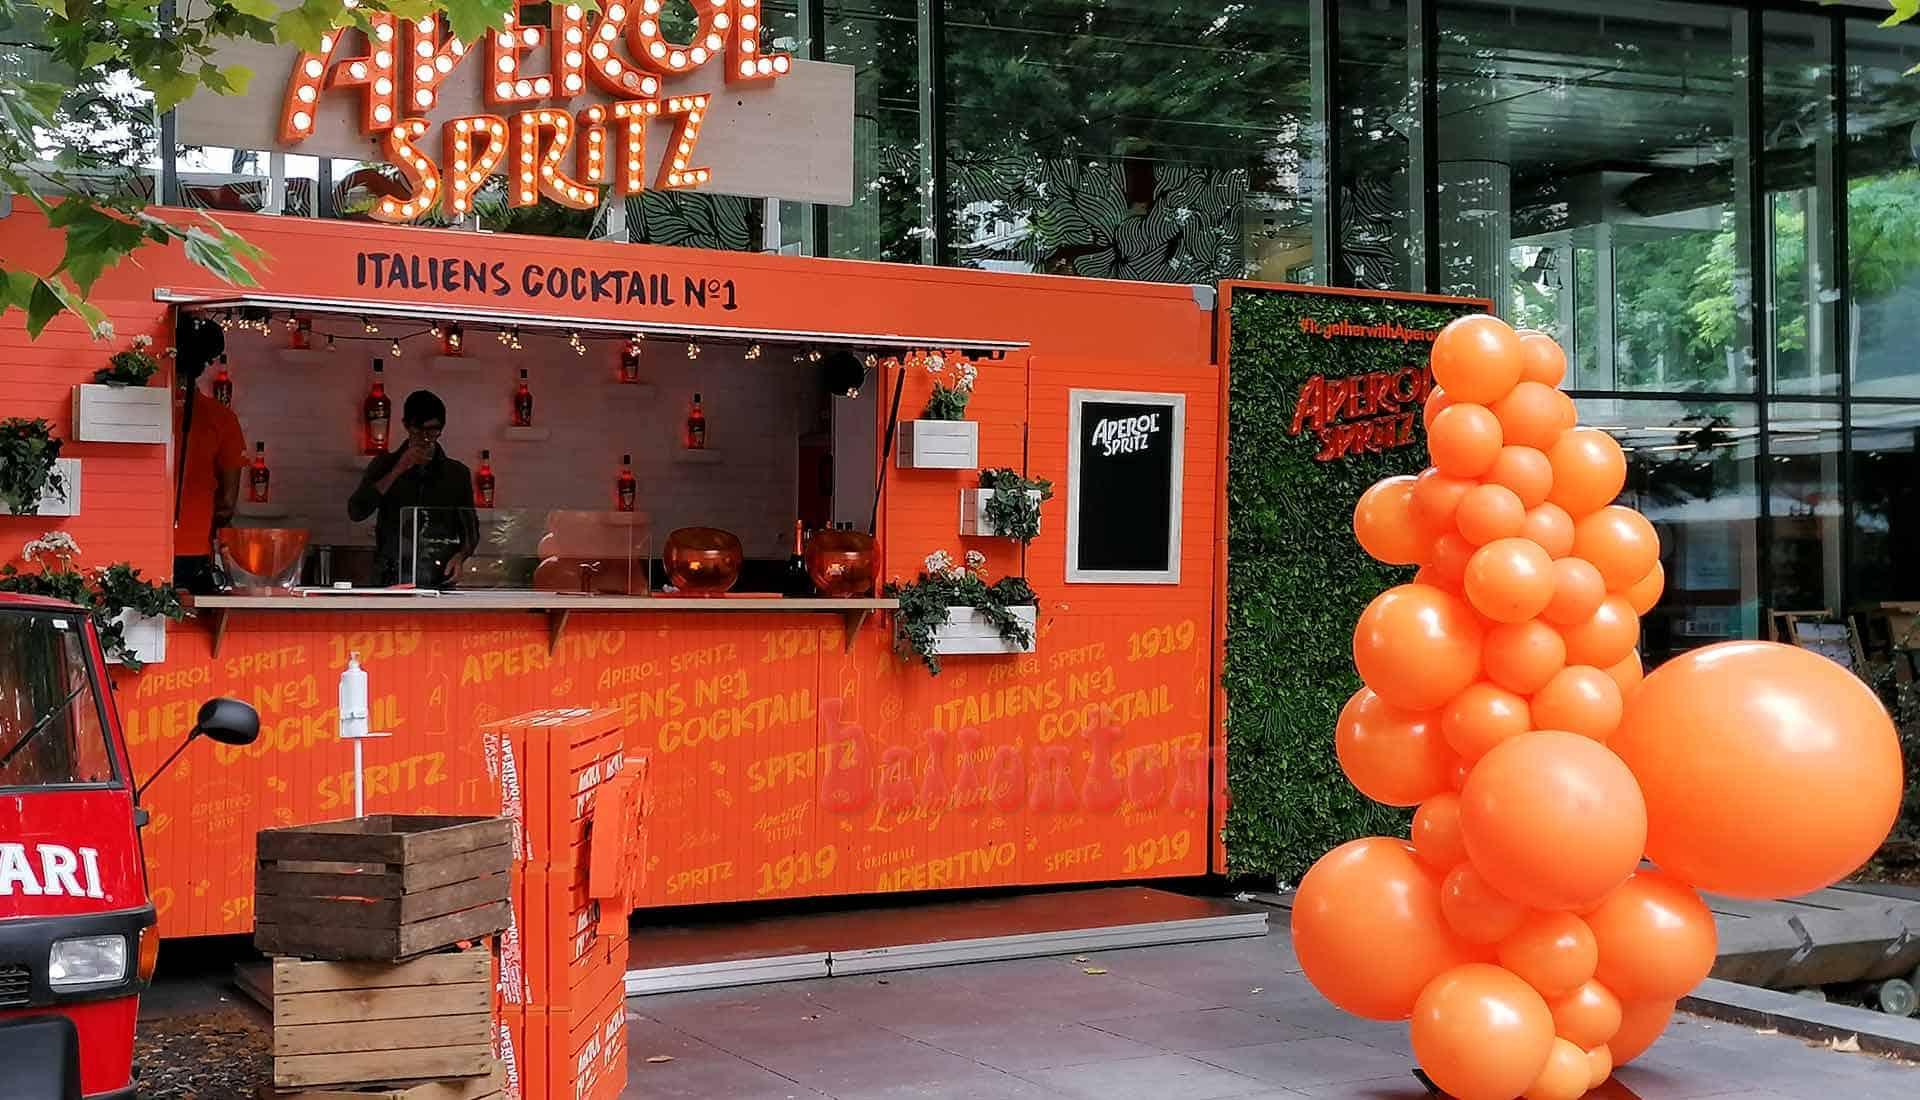 Aperol Spritz Bar Tour 2020 Organic Ballonsäule